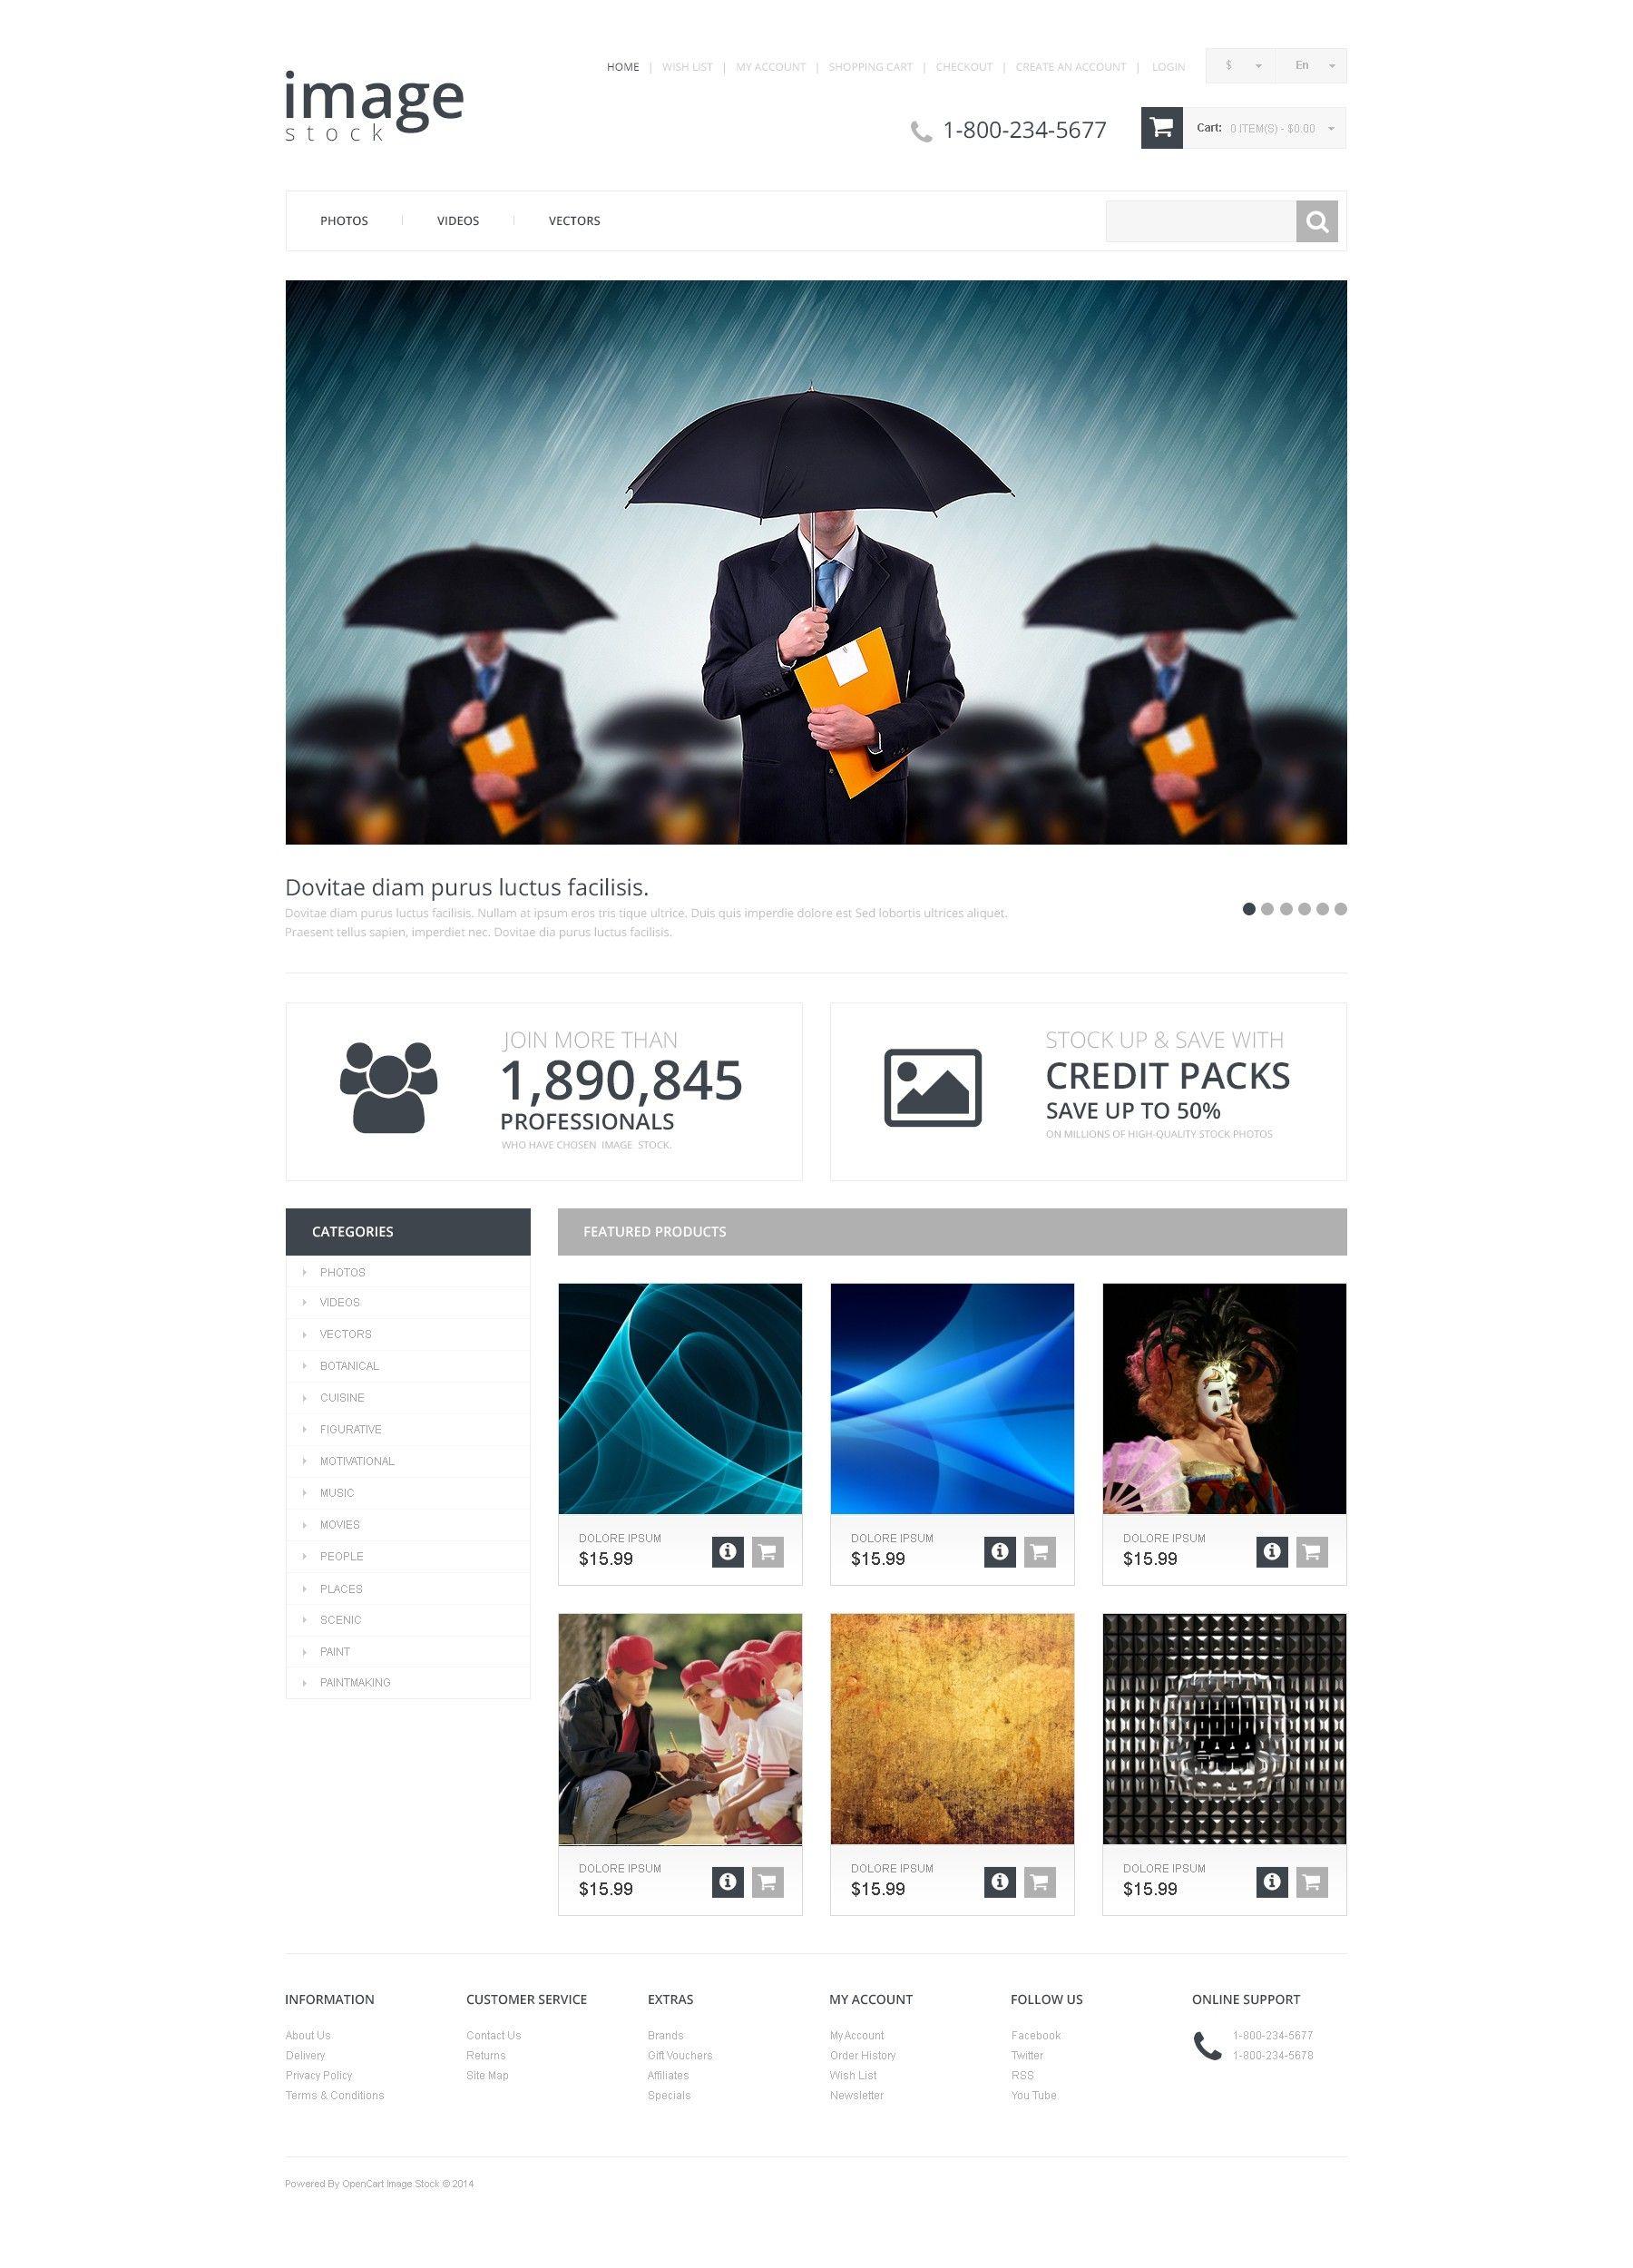 Photostock Photo Stock Photography Webdesign For Opencart Template